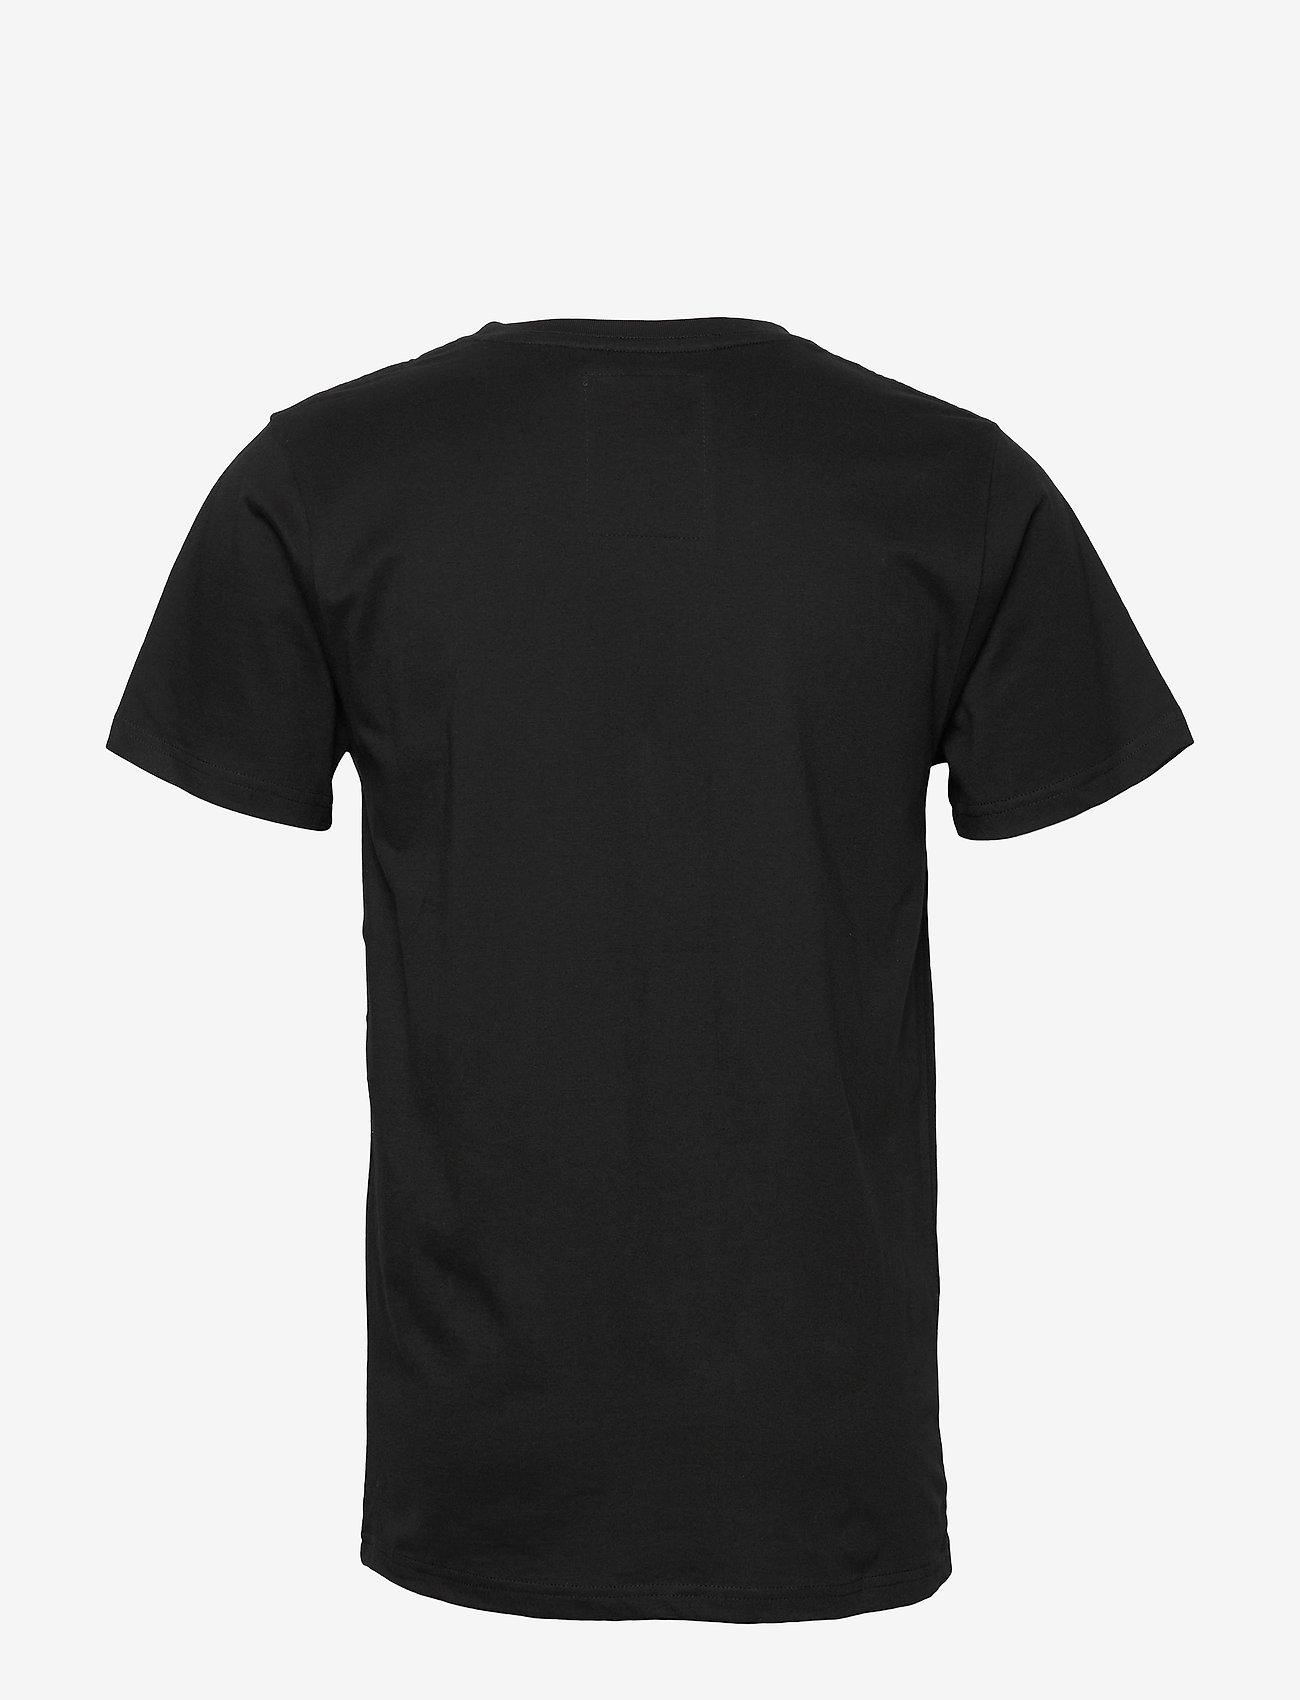 DEDICATED - T-shirt Stockholm Dedicated Logo - perus t-paidat - black